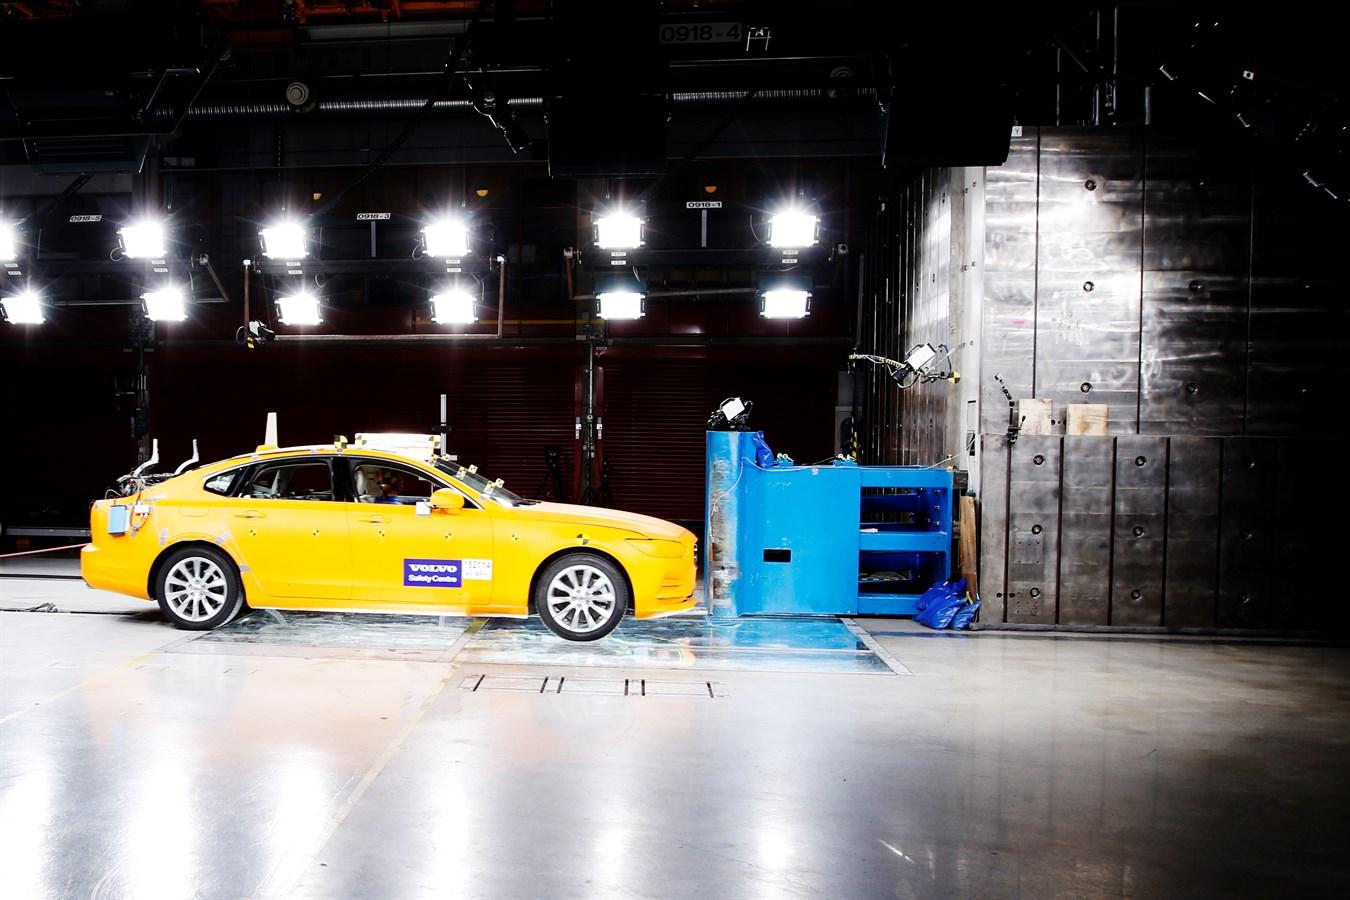 Volvo S90 Small Overlap Crash Test Volvo Cars Global Media Newsroom